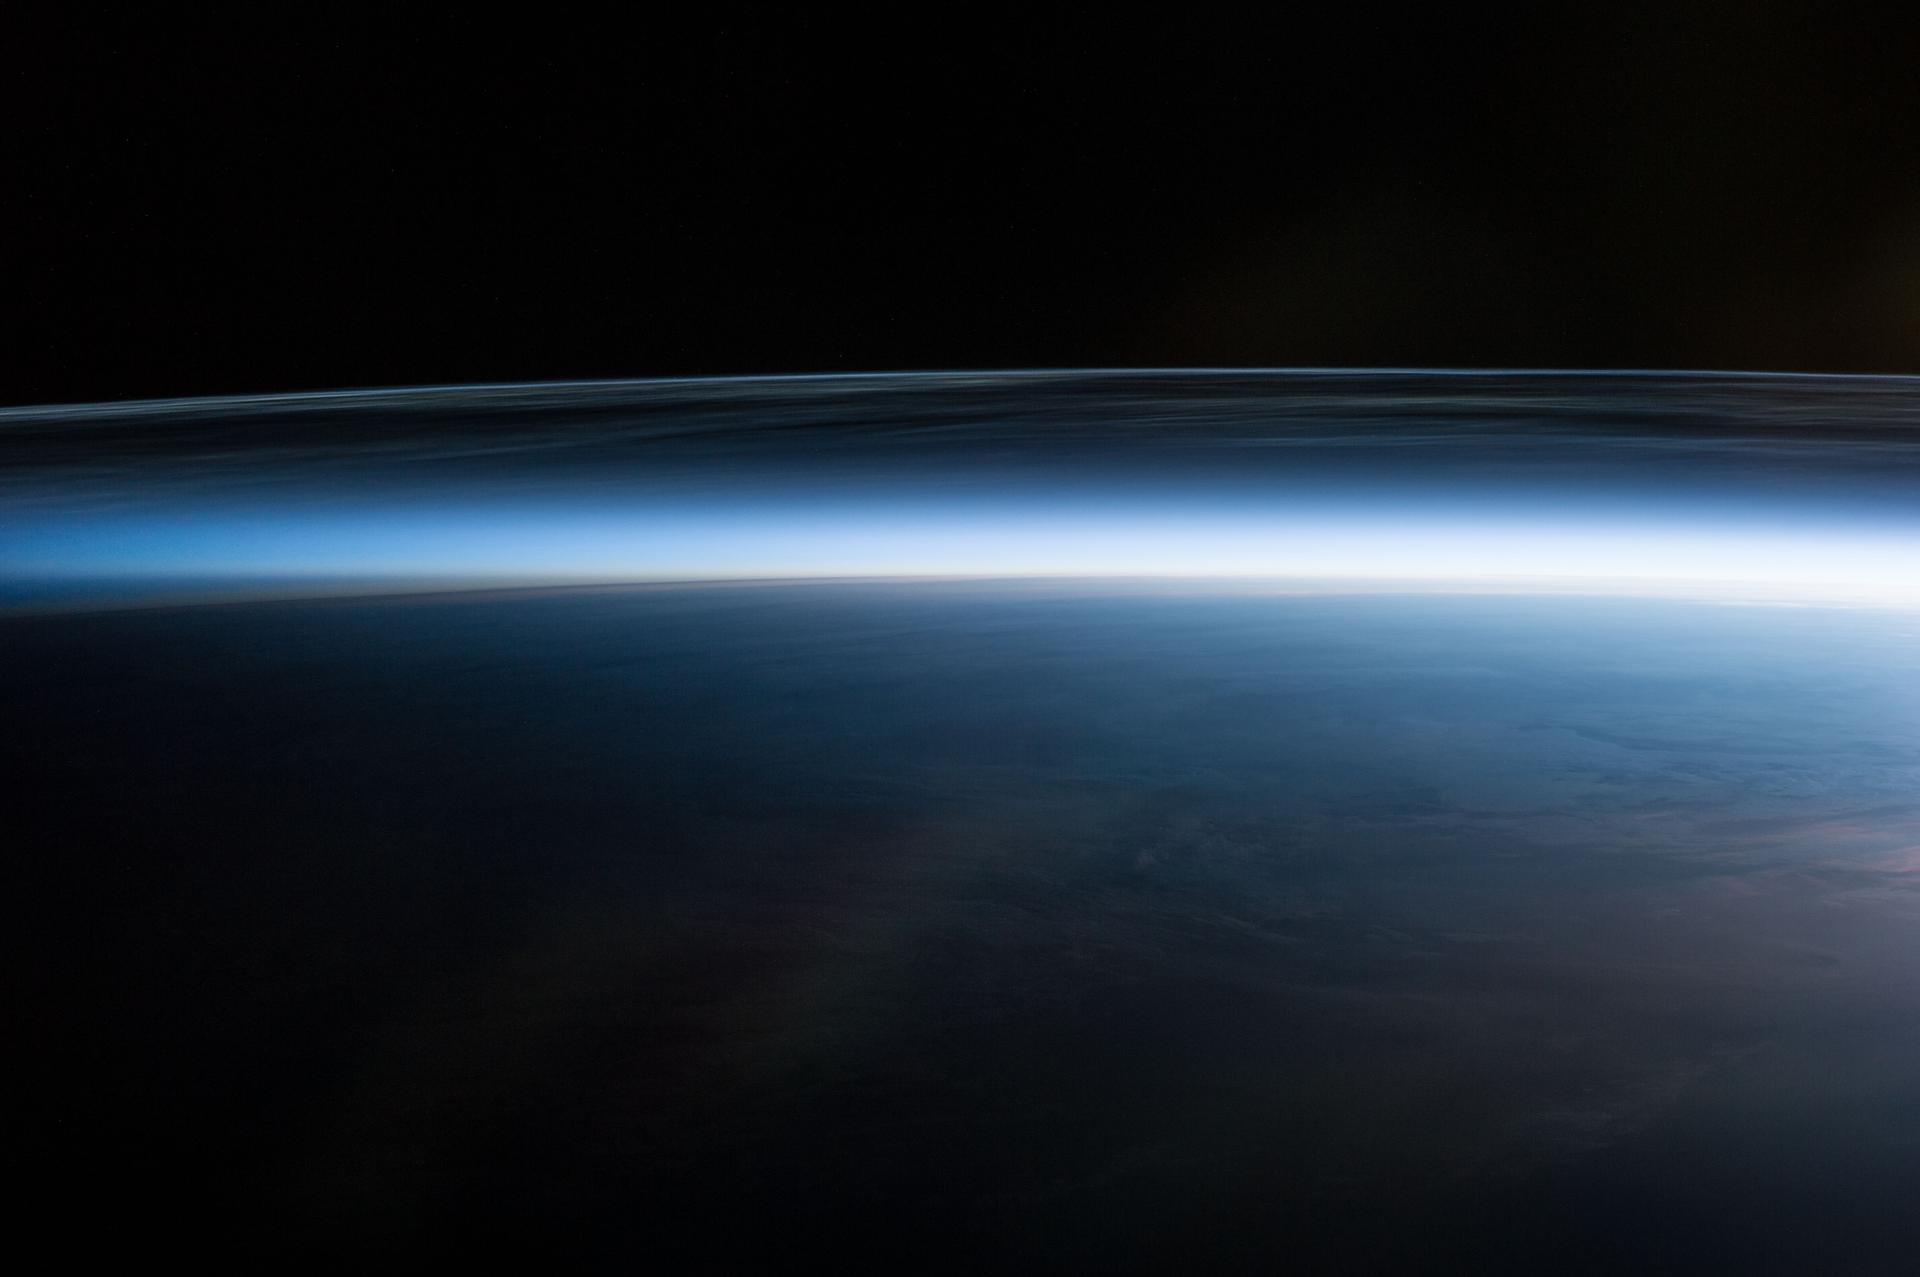 Polar Mesospheric Clouds over Canada